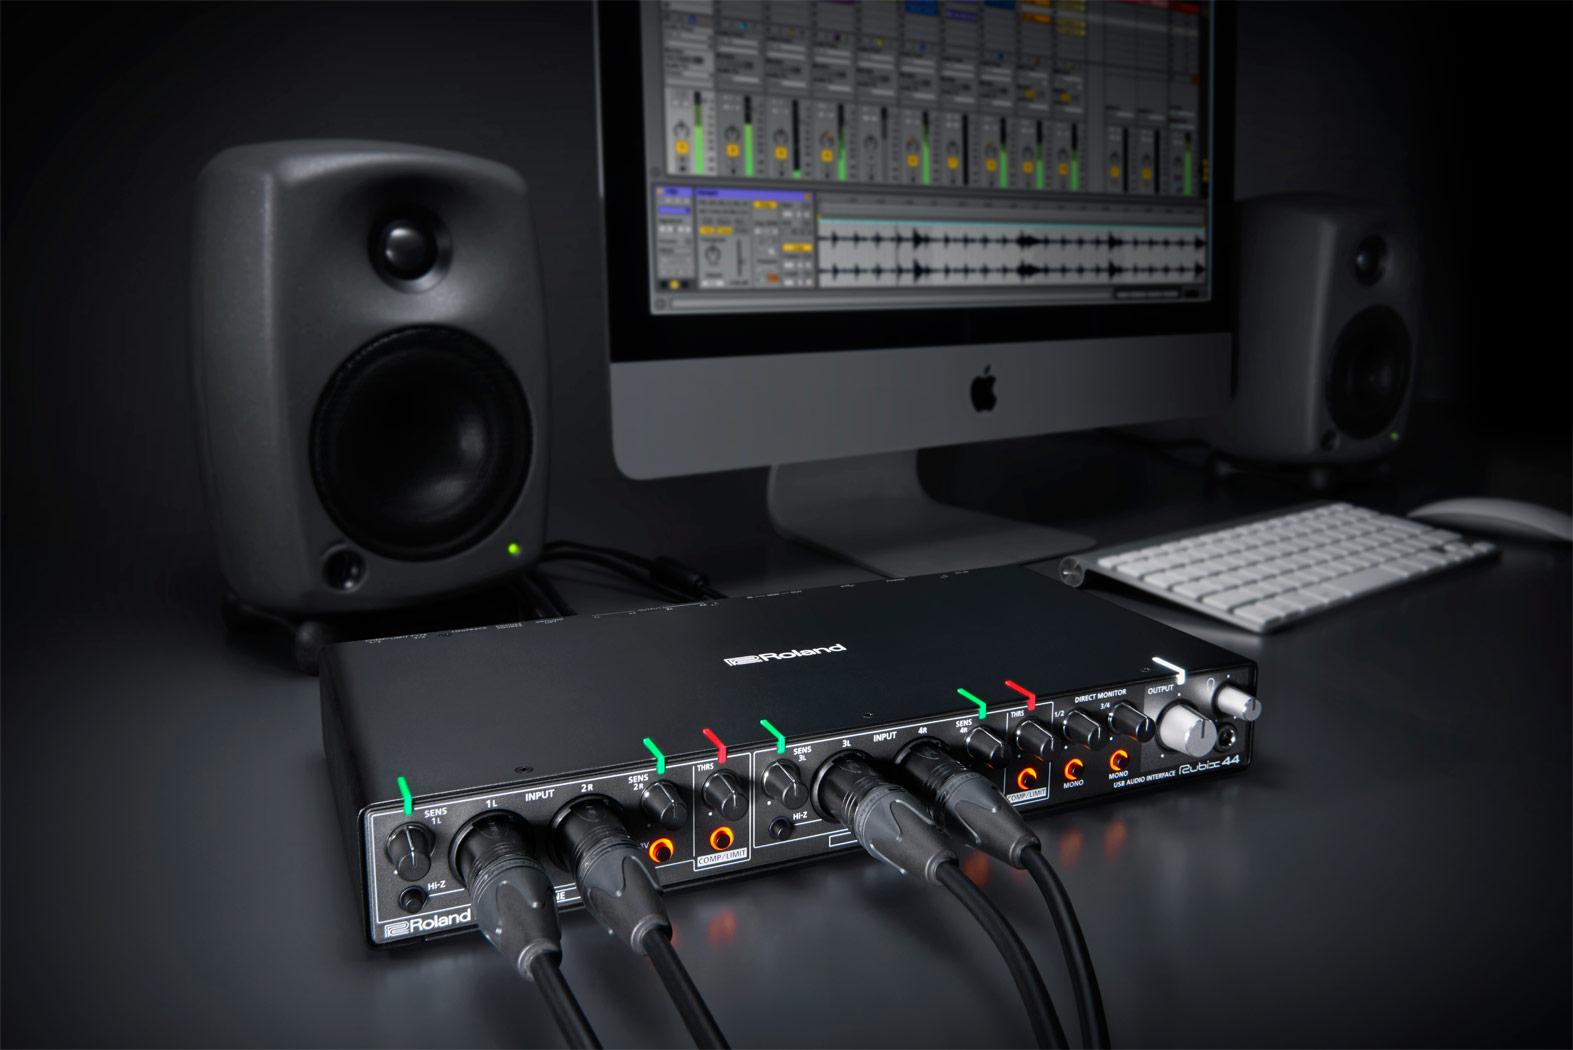 Roland Rubix44 Usb Audio Interface Combo Xlr Wiring Diagram Includes Ableton Live Lite